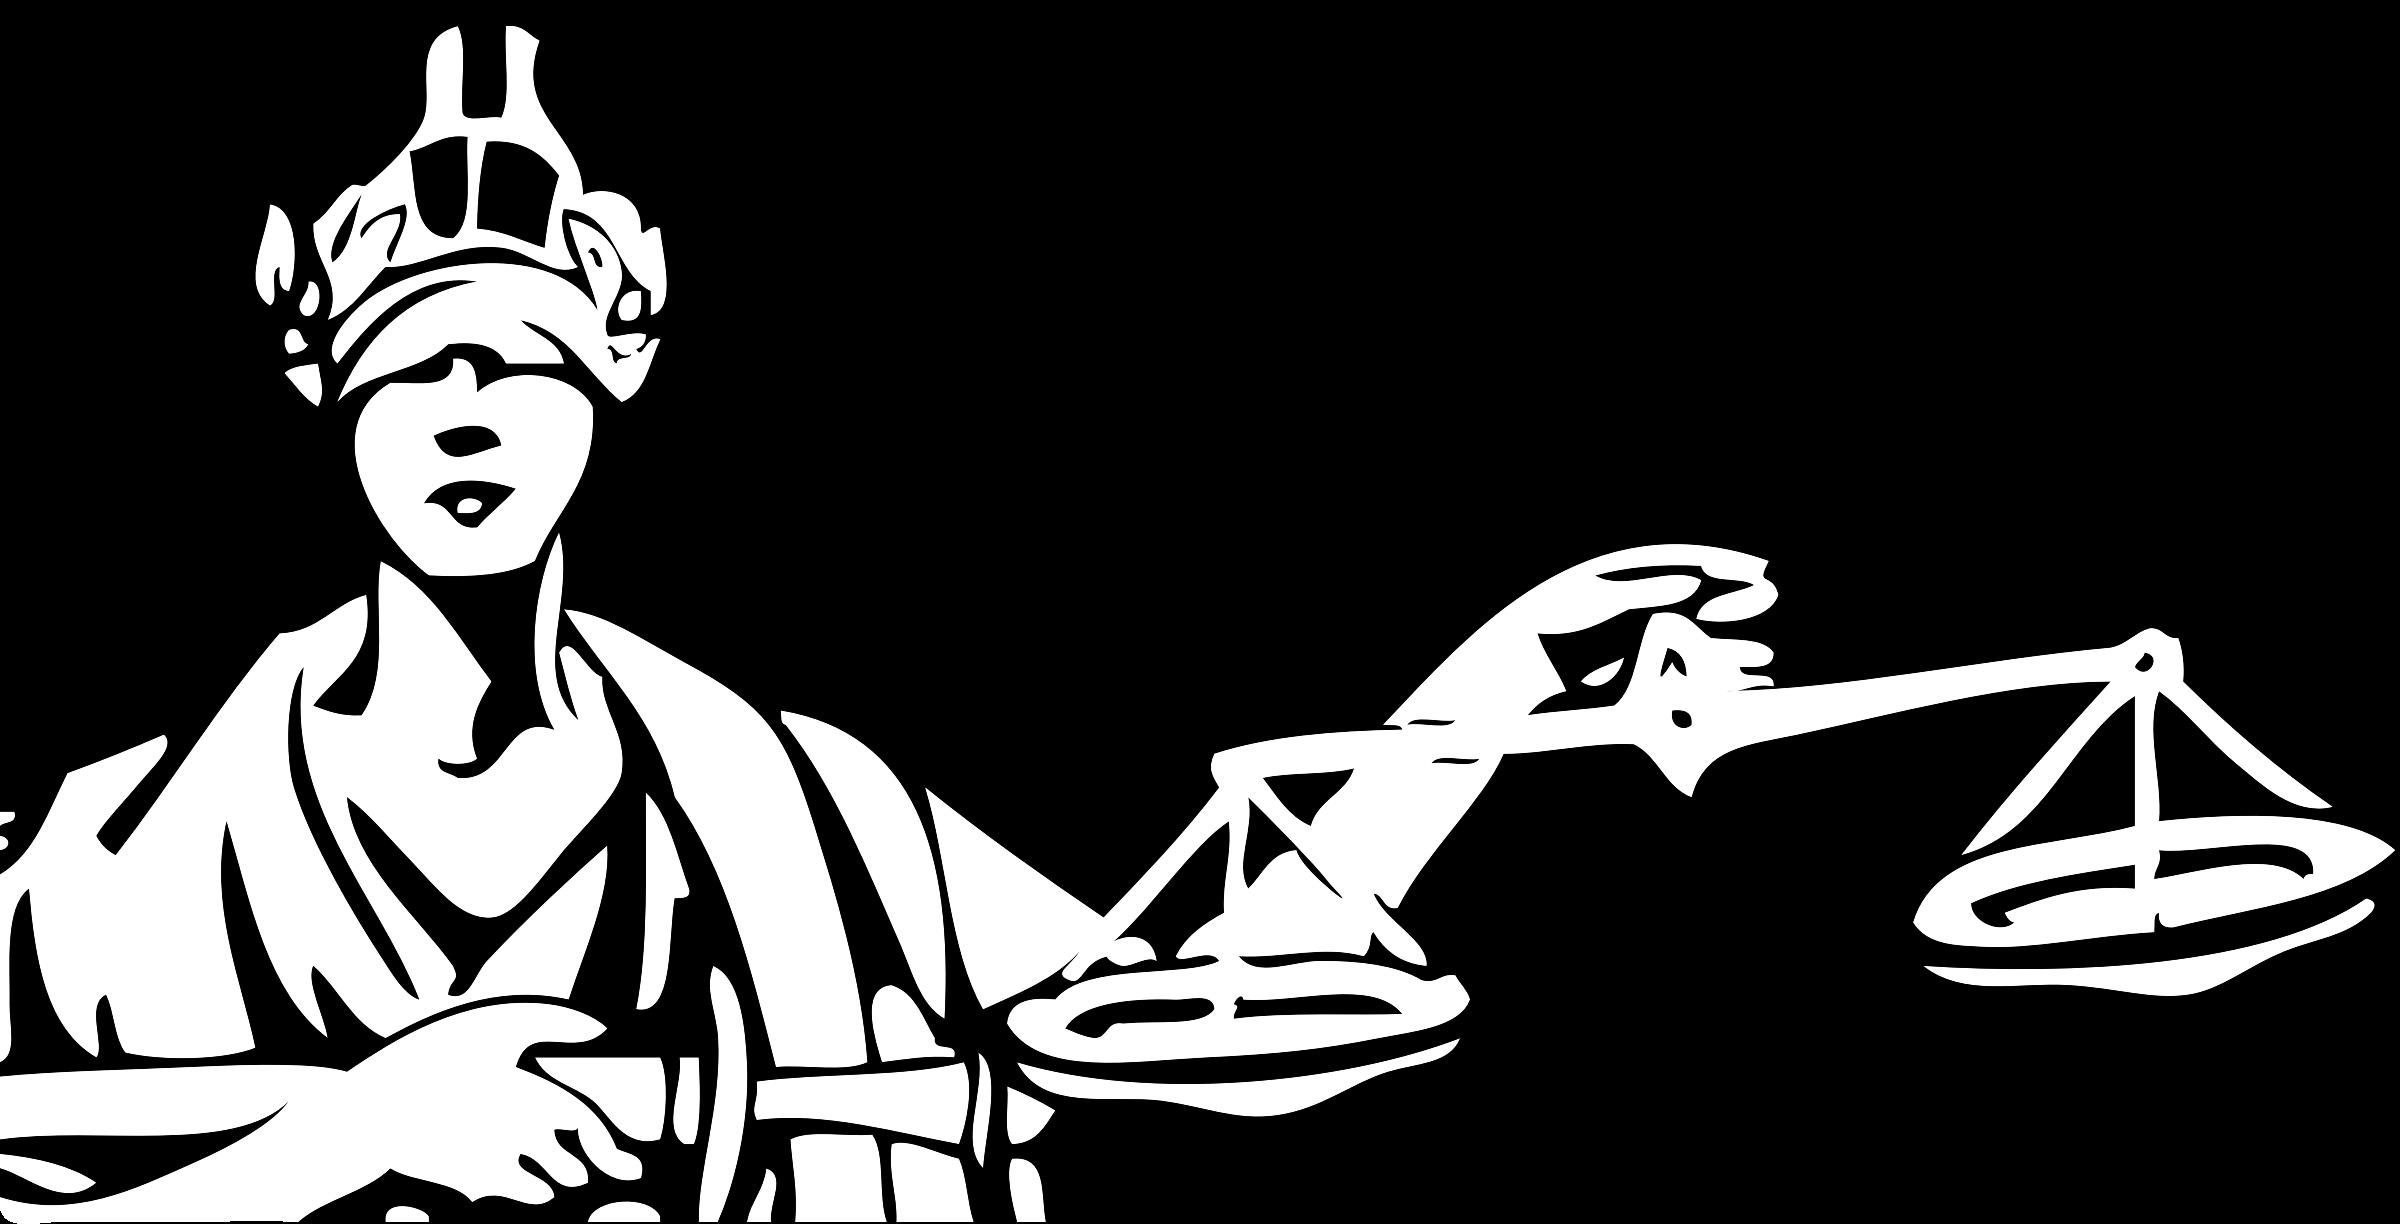 Justice clipart cartoon. The dood interviews an